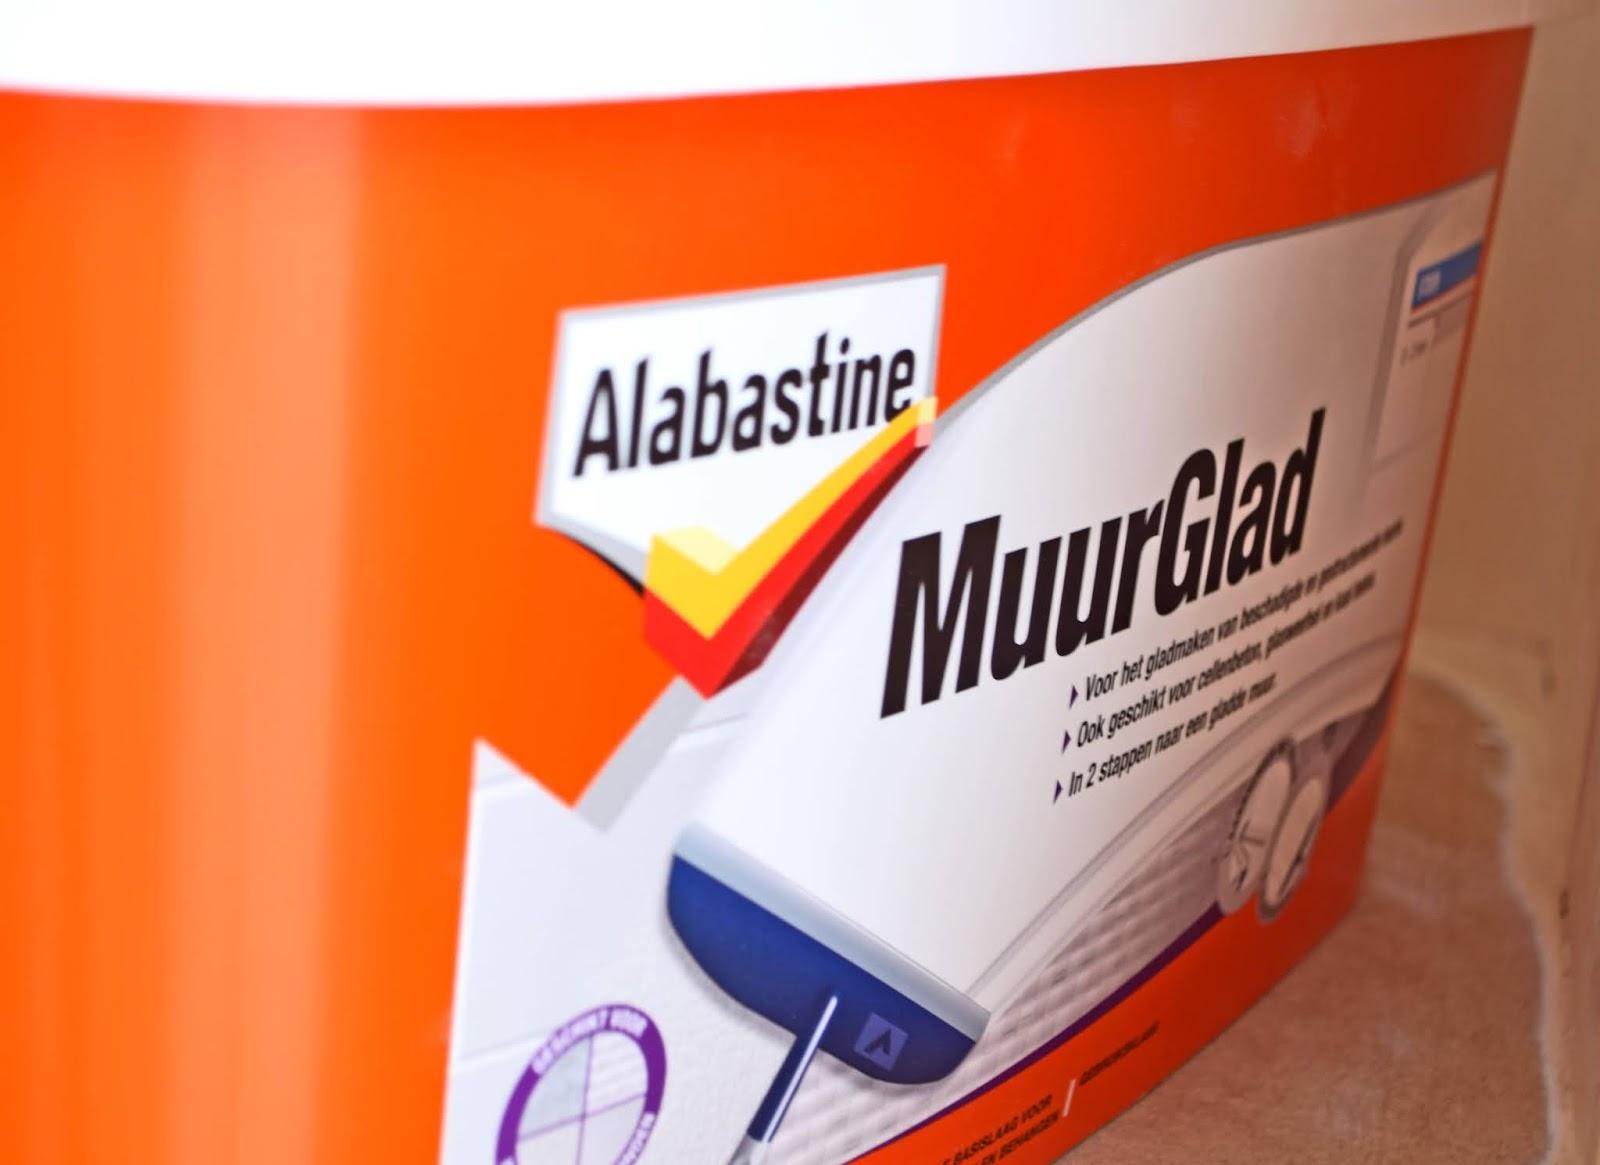 Alabastine MuurGlad